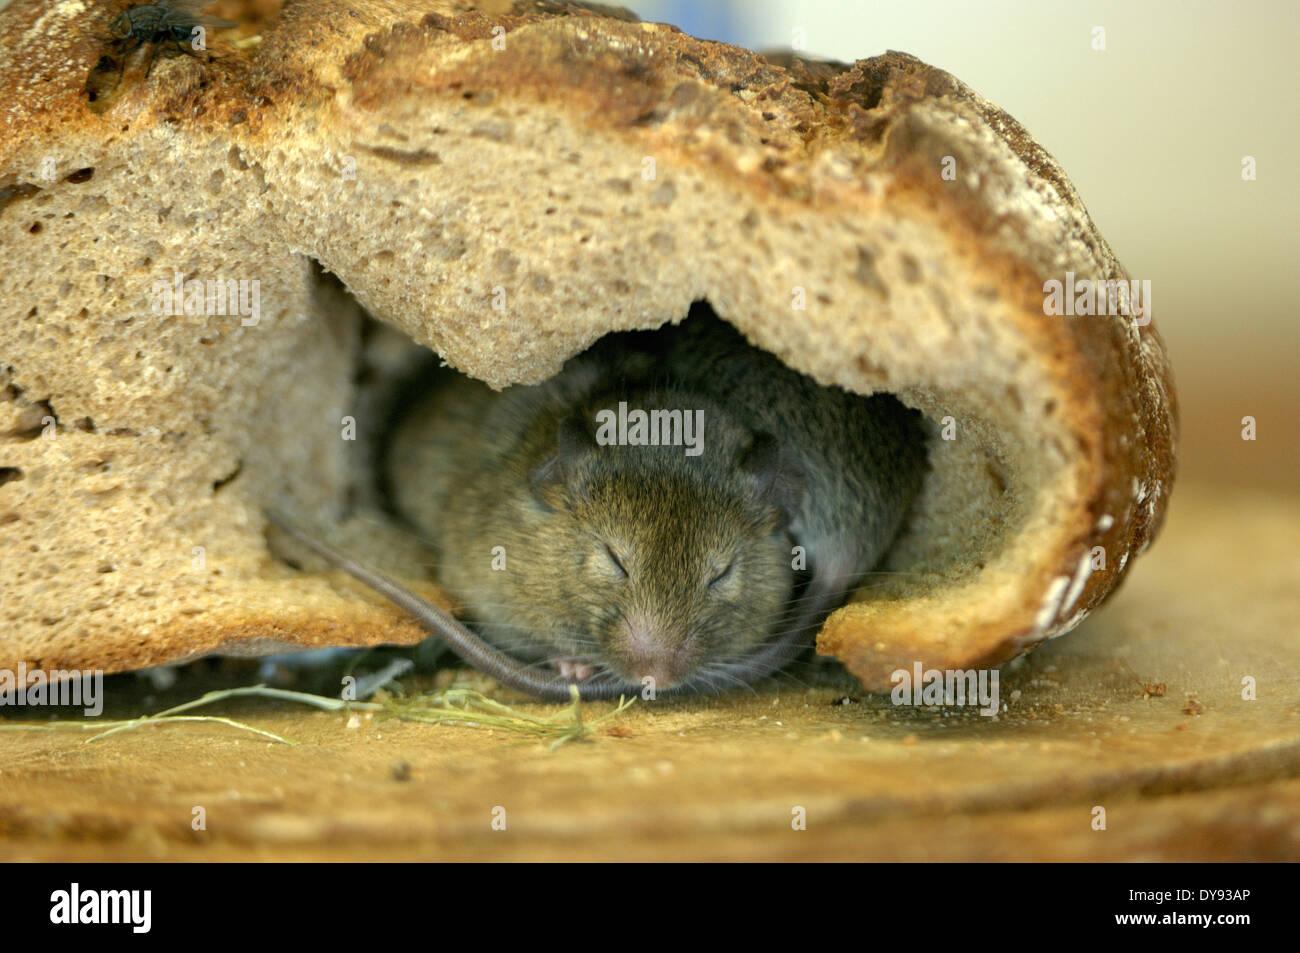 brown rat street rat common rat Rattus norvegicus muroids rats Norway rat rodents rat bread animal animals Germany Europe, - Stock Image